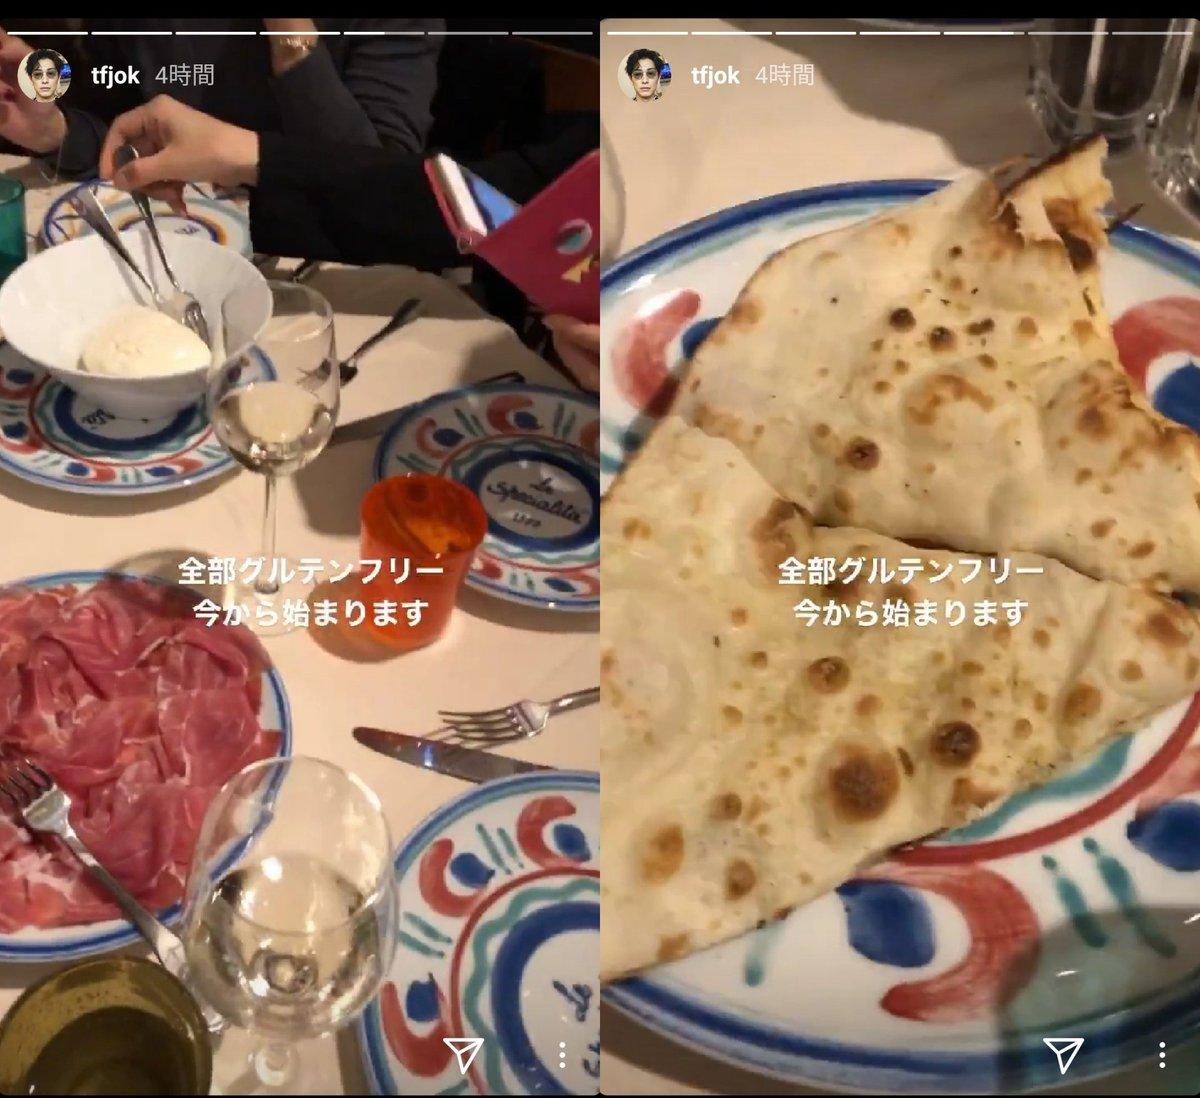 "test ツイッターメディア - #ディーンフジオカ IGStories 2020/2/23~24 1)全部グルテンフリー今から始まります 2)グルテンフリーの宴 3)グルテンフリー〆 4)パトロール ✨ ミラノにグルテンフリーレストランが多い  パスタ,ピッツア~イタリア人が好む小麦にアレルギーや不快症状が現れる""グルテン不耐症""の人達が増加中 https://t.co/uDmBMIr1rr"